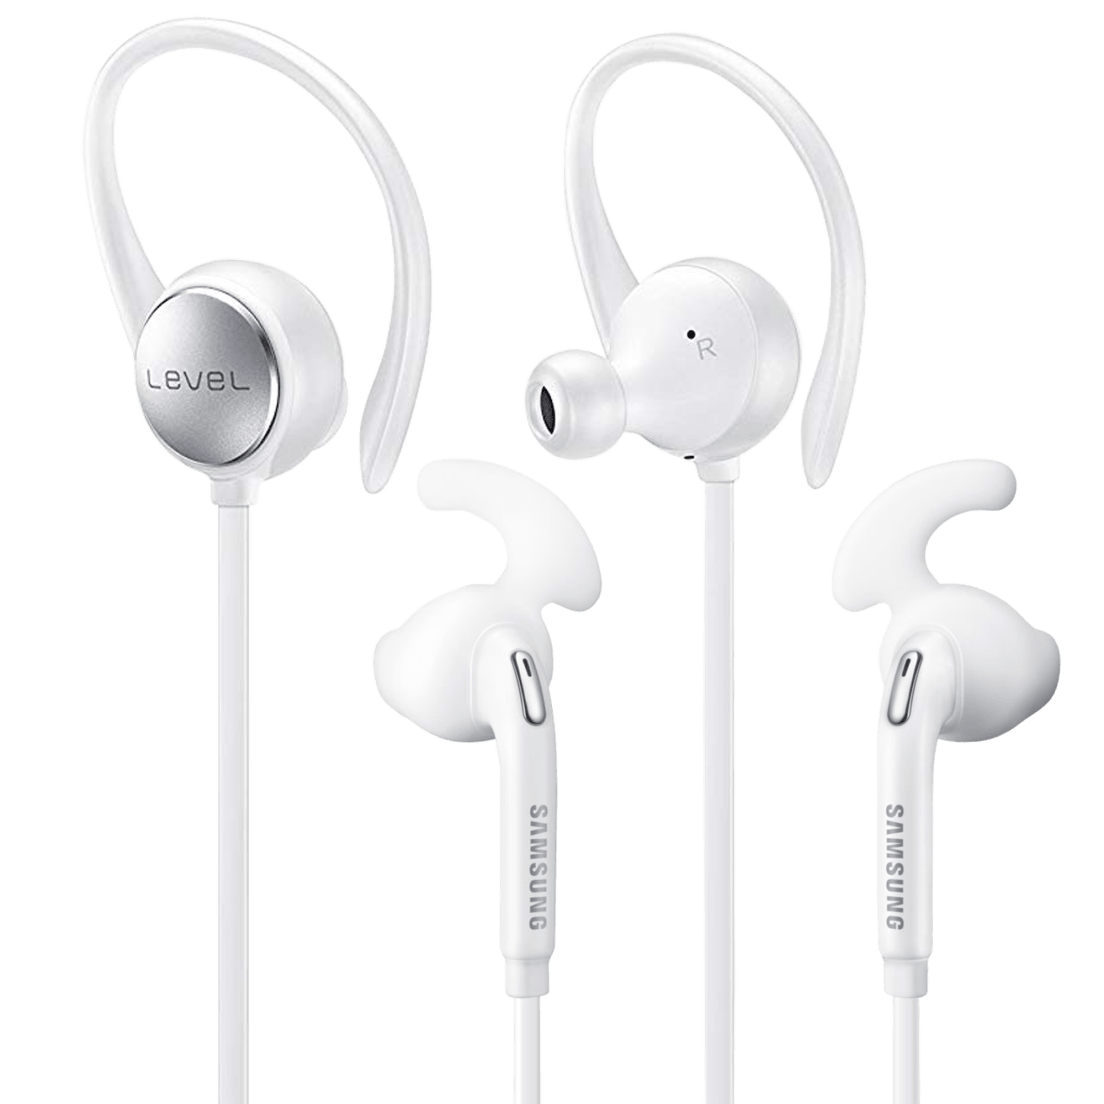 5e963c706cf Samsung Level Active Bluetooth + In-Ear Headphones Bundle